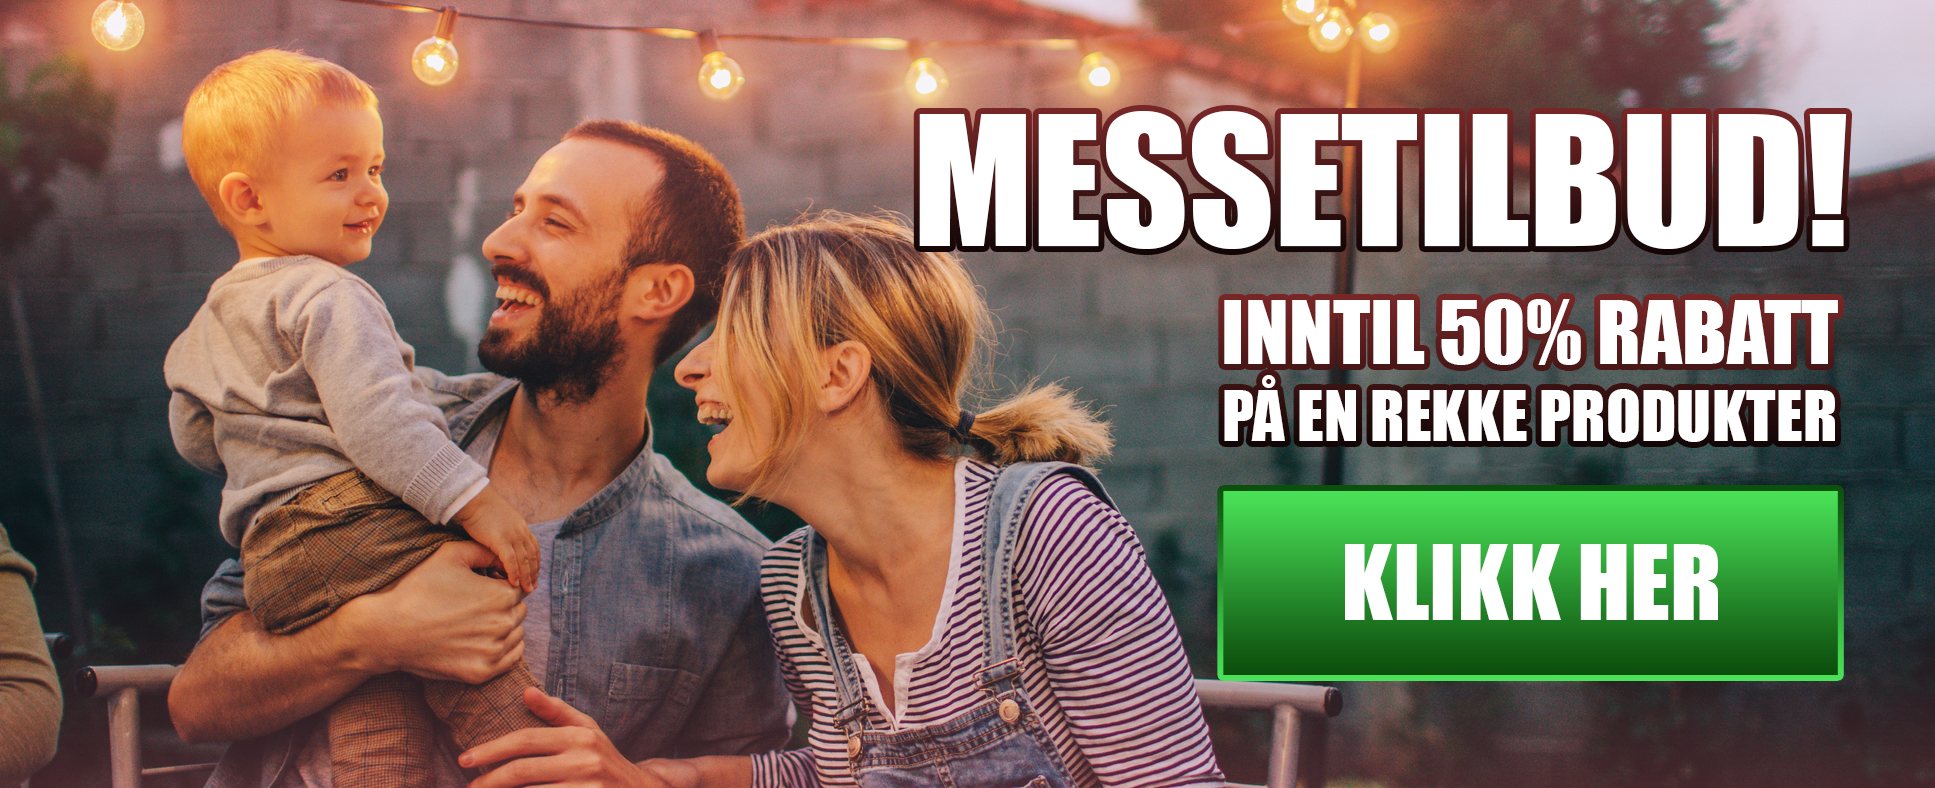 Messetilbud Annonse_intill50prosent